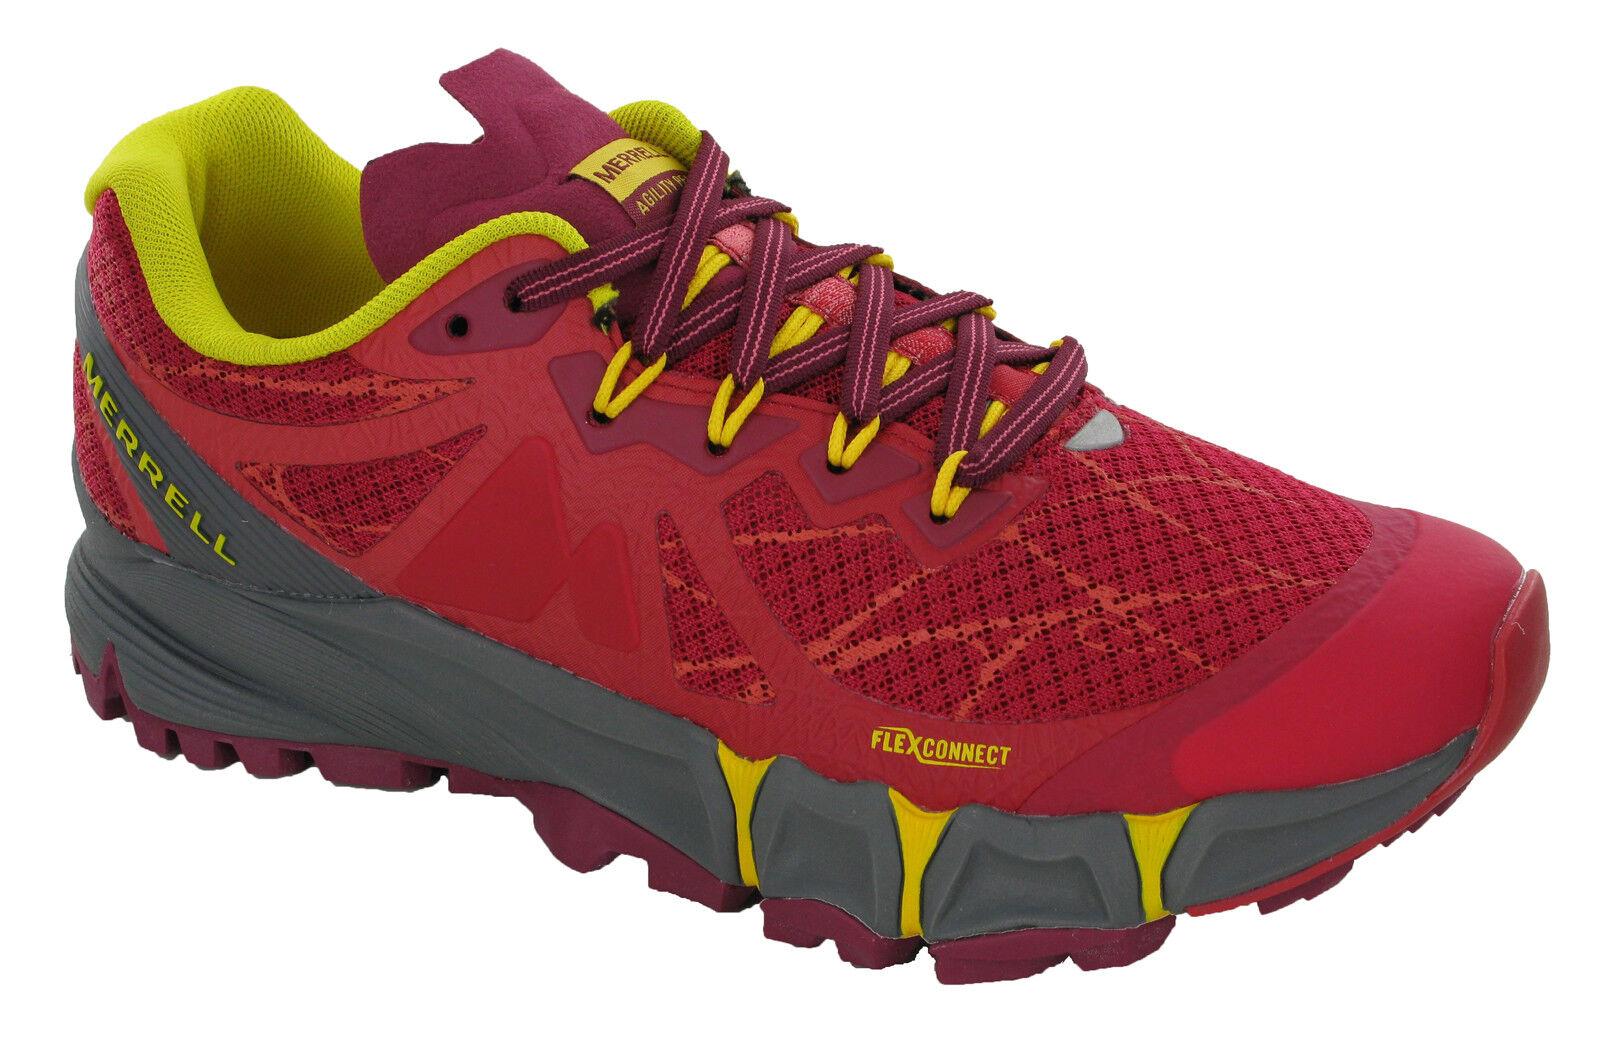 Merrell agilità picco Flex Da Donna Trail Running Sport Scarpe da ginnastica J37700